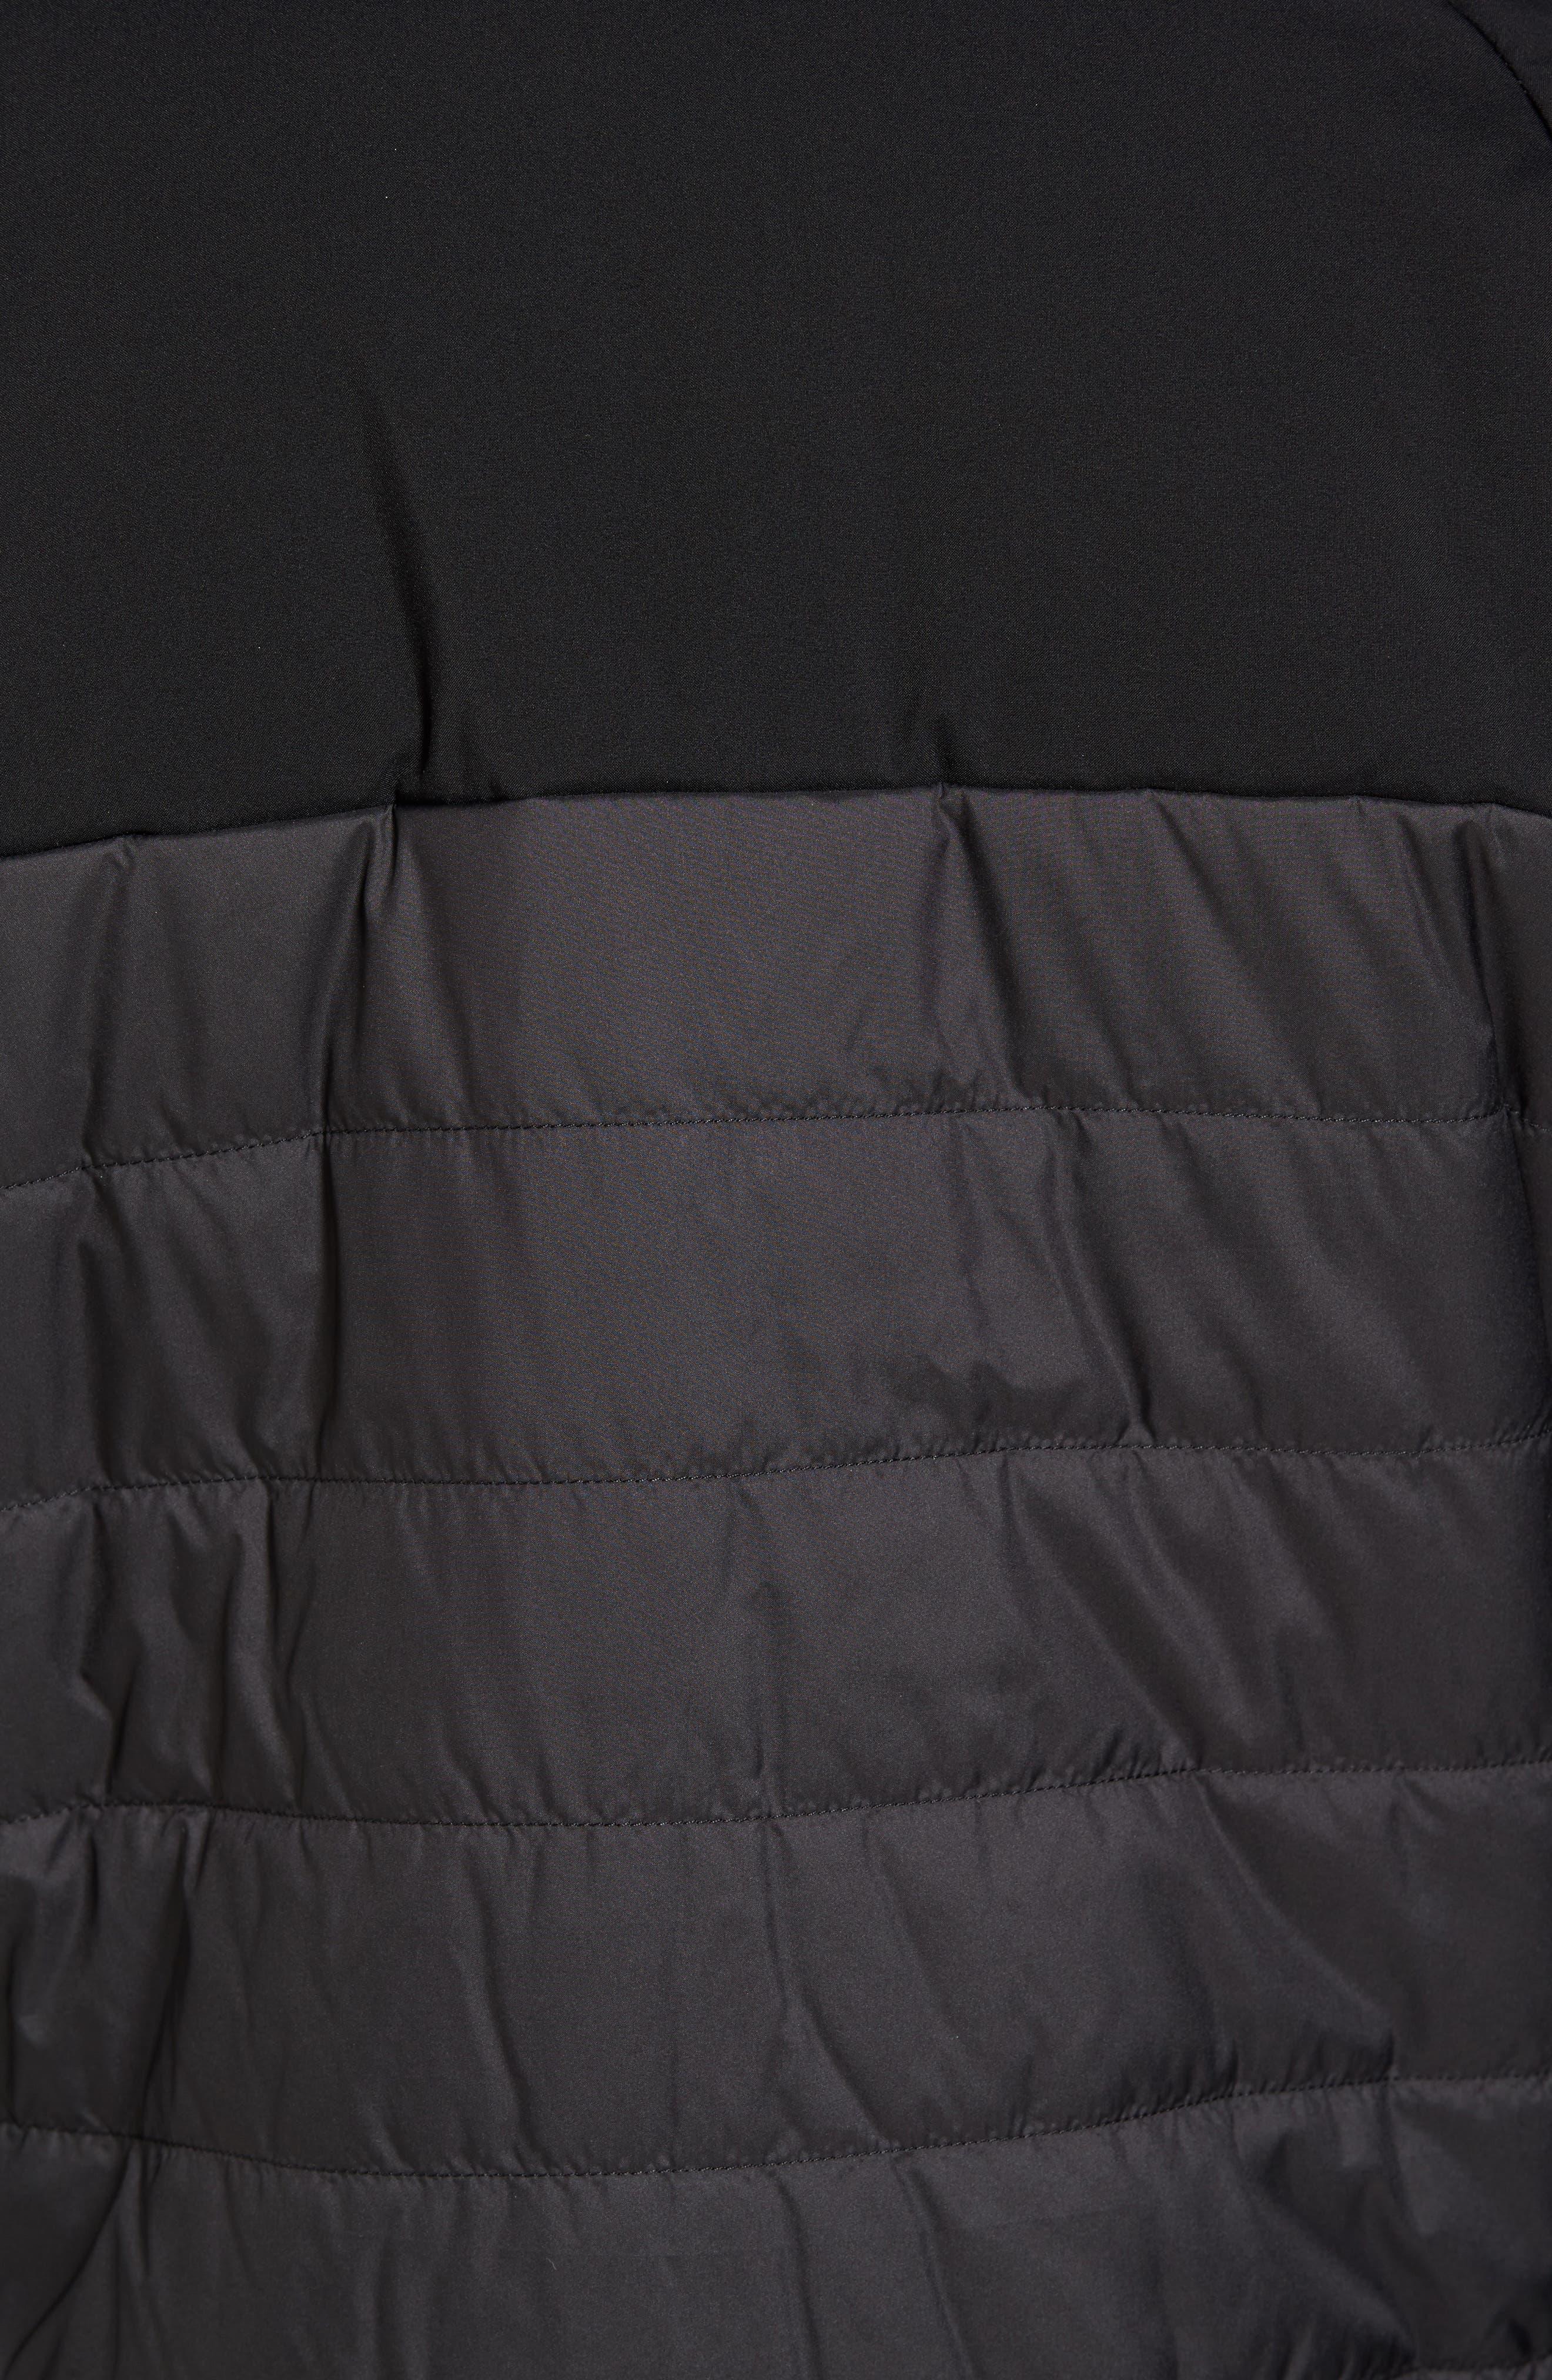 Skokie Jacket,                             Alternate thumbnail 6, color,                             001